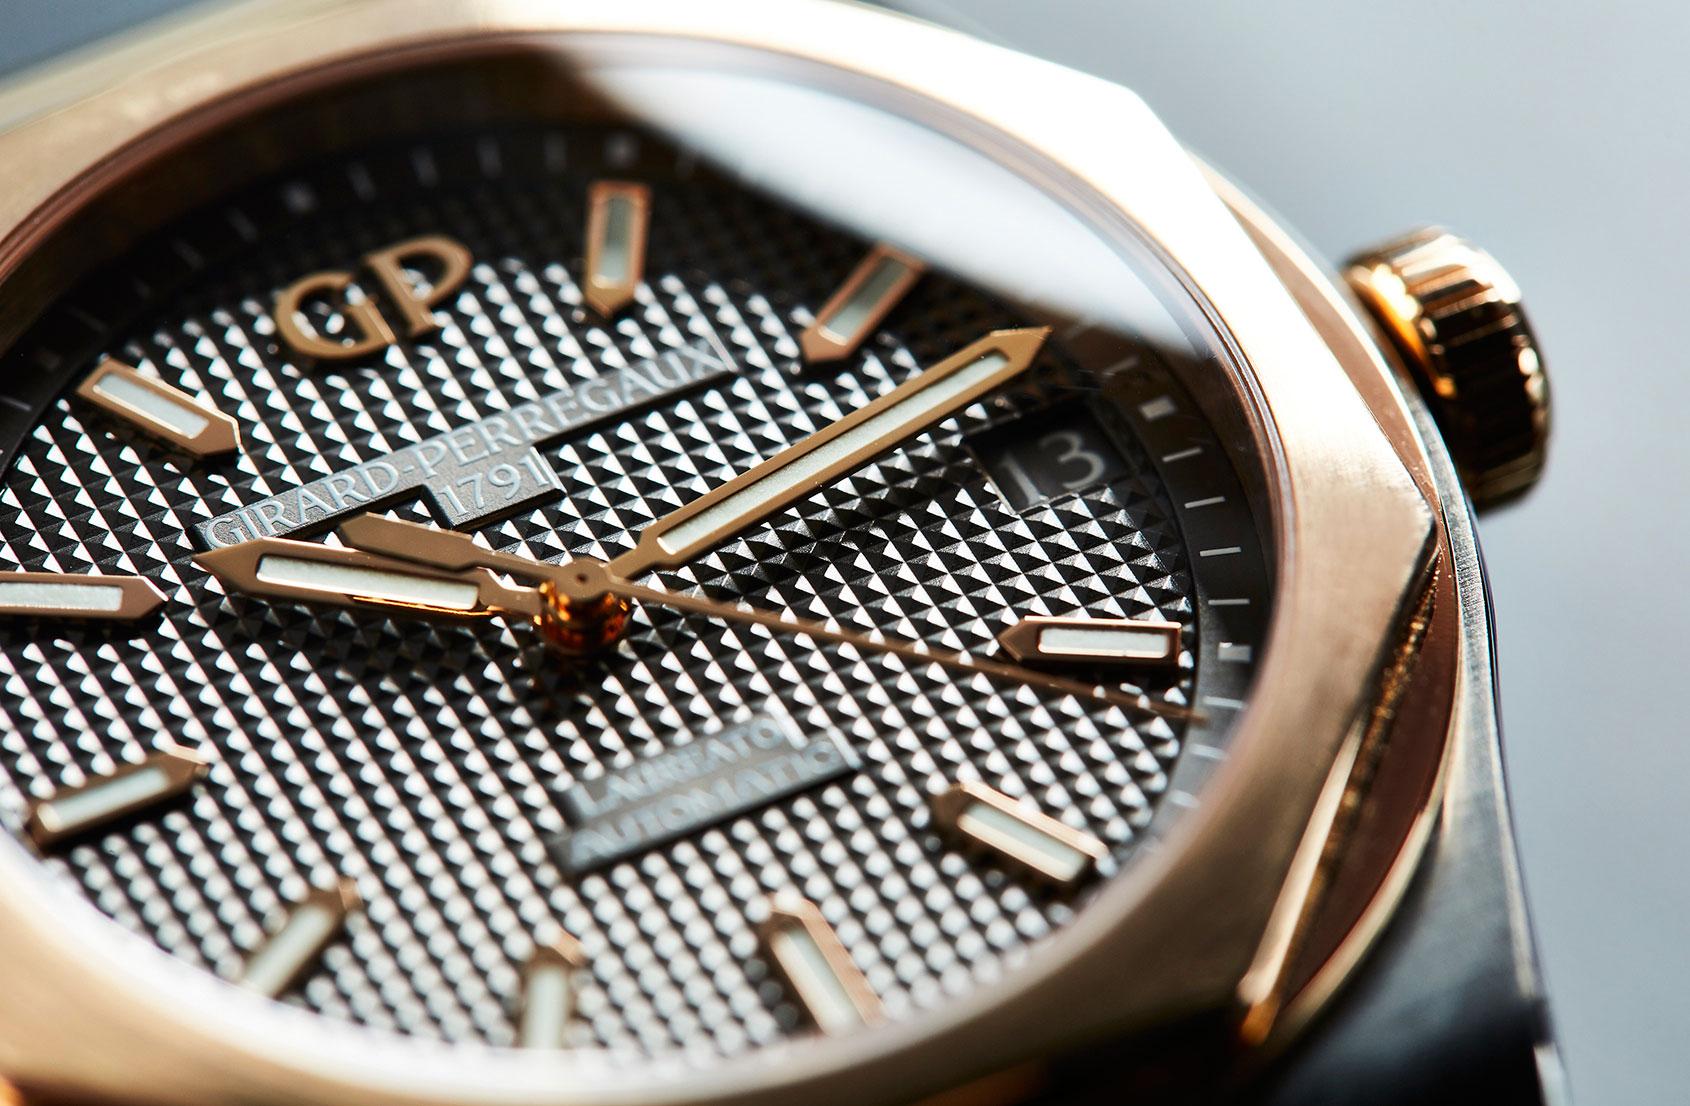 Industrial aesthetics – the Girard-Perregaux Laureato in titanium and pink gold